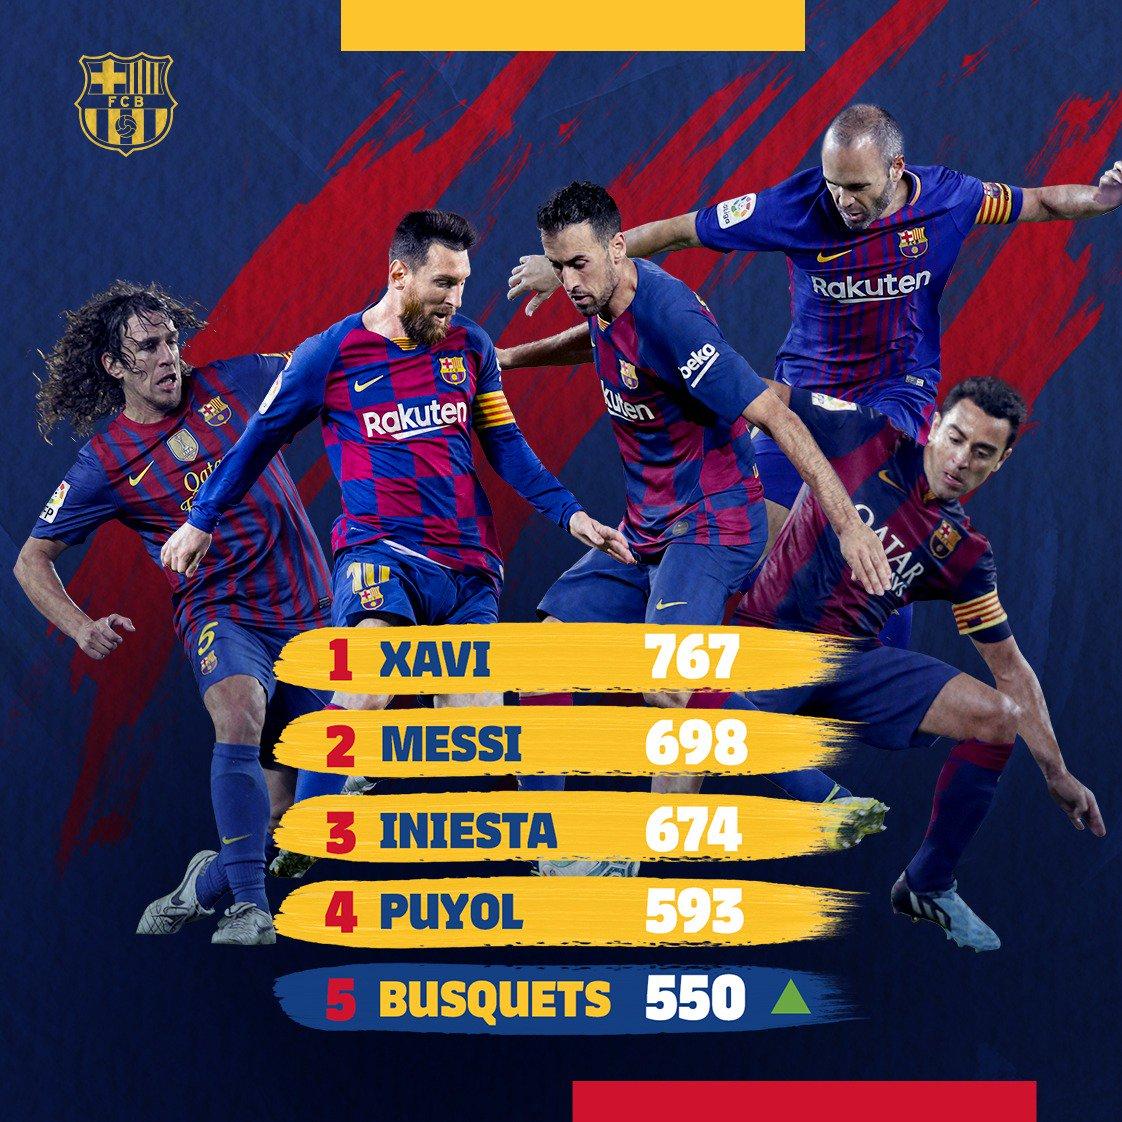 😍 @5sergiob ✅ 550 Barça appearances! 💪 All-time 🔝5️⃣! Congrats, Busi! 🔵🔴👏